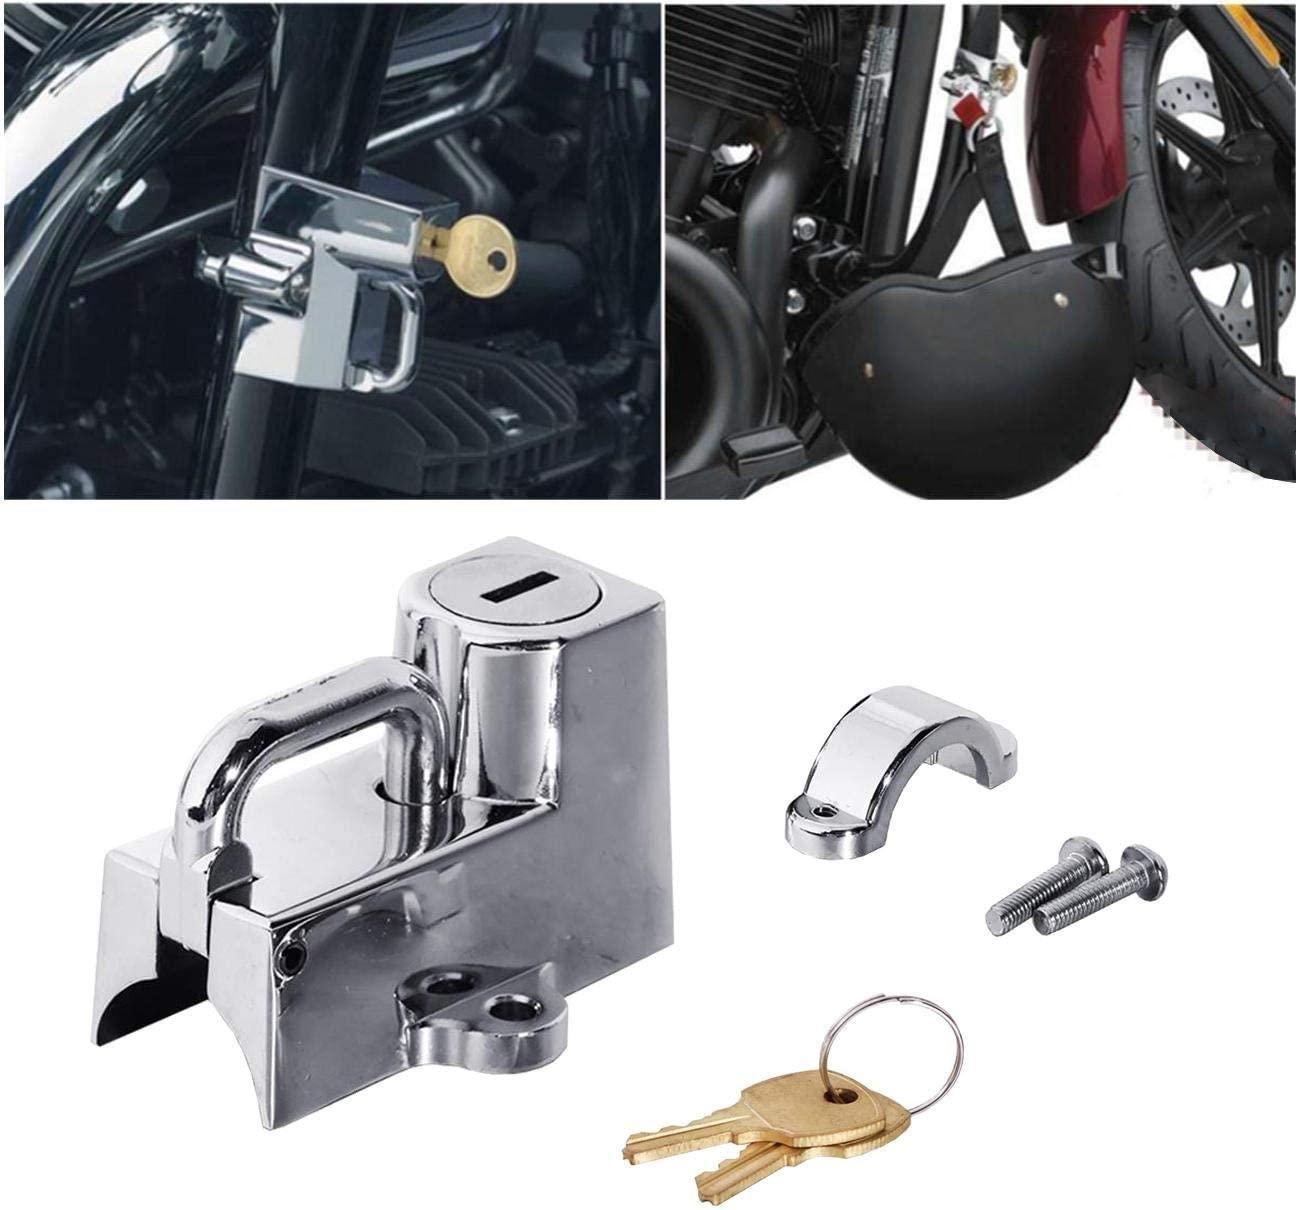 Xiteman For Kuryakyn Cruiser Motorcycle Helmet Lock 22mm 7/8 For All 1-1/4 Inch To 1-1/2 Inch